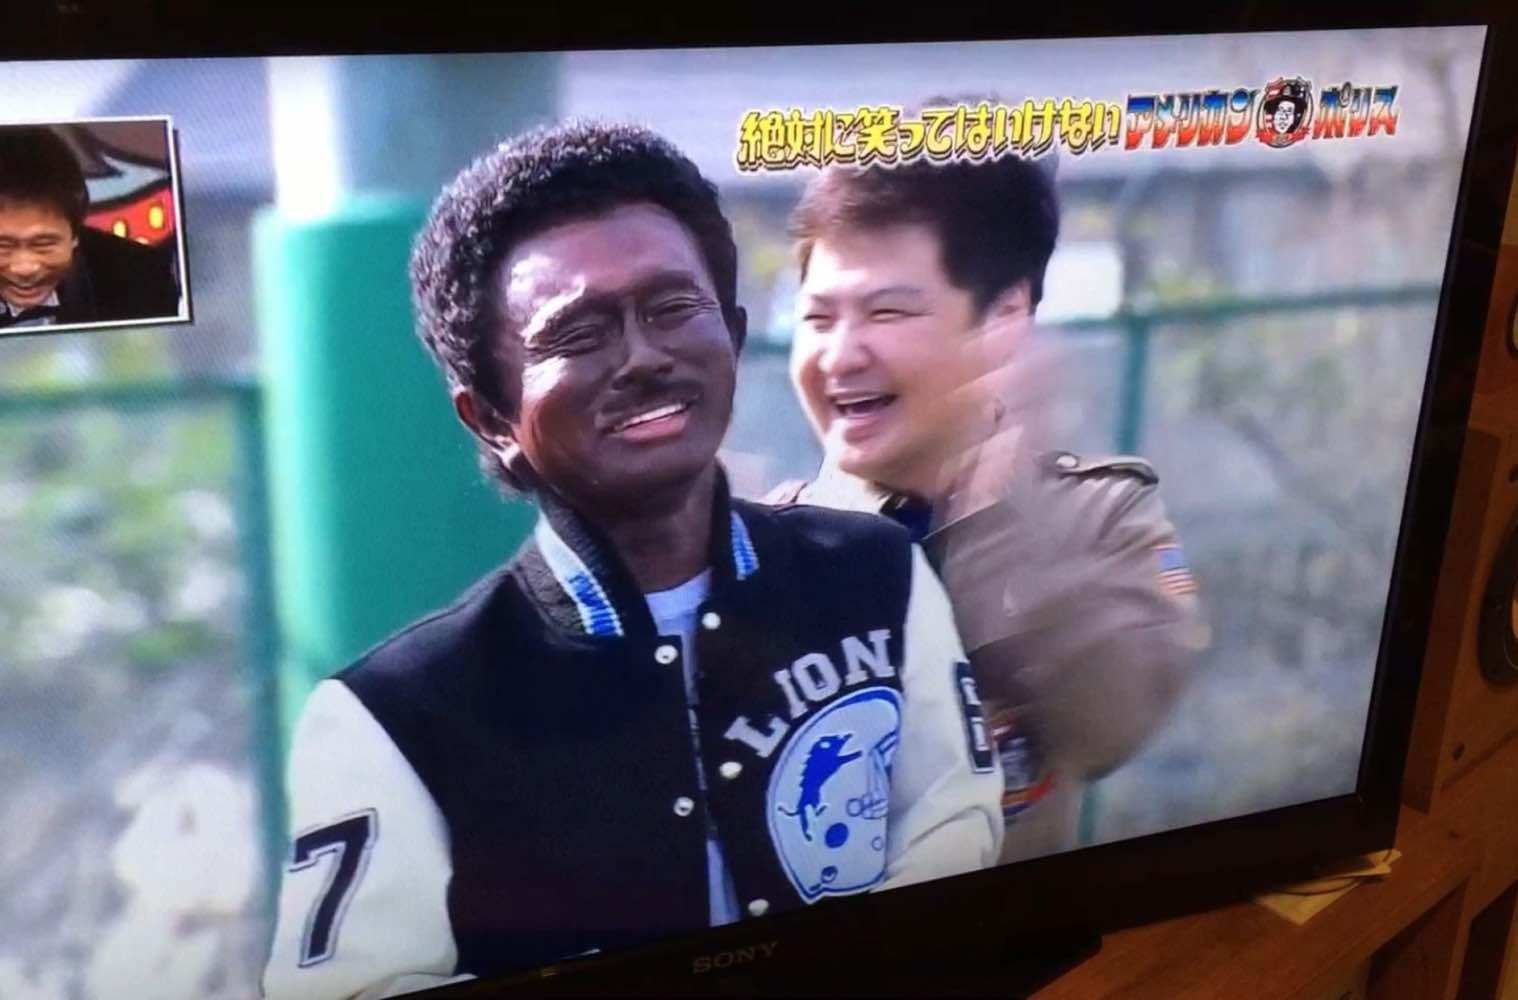 Japanese TV show's 'Eddie Murphy' blackface skit slammed (Watch)